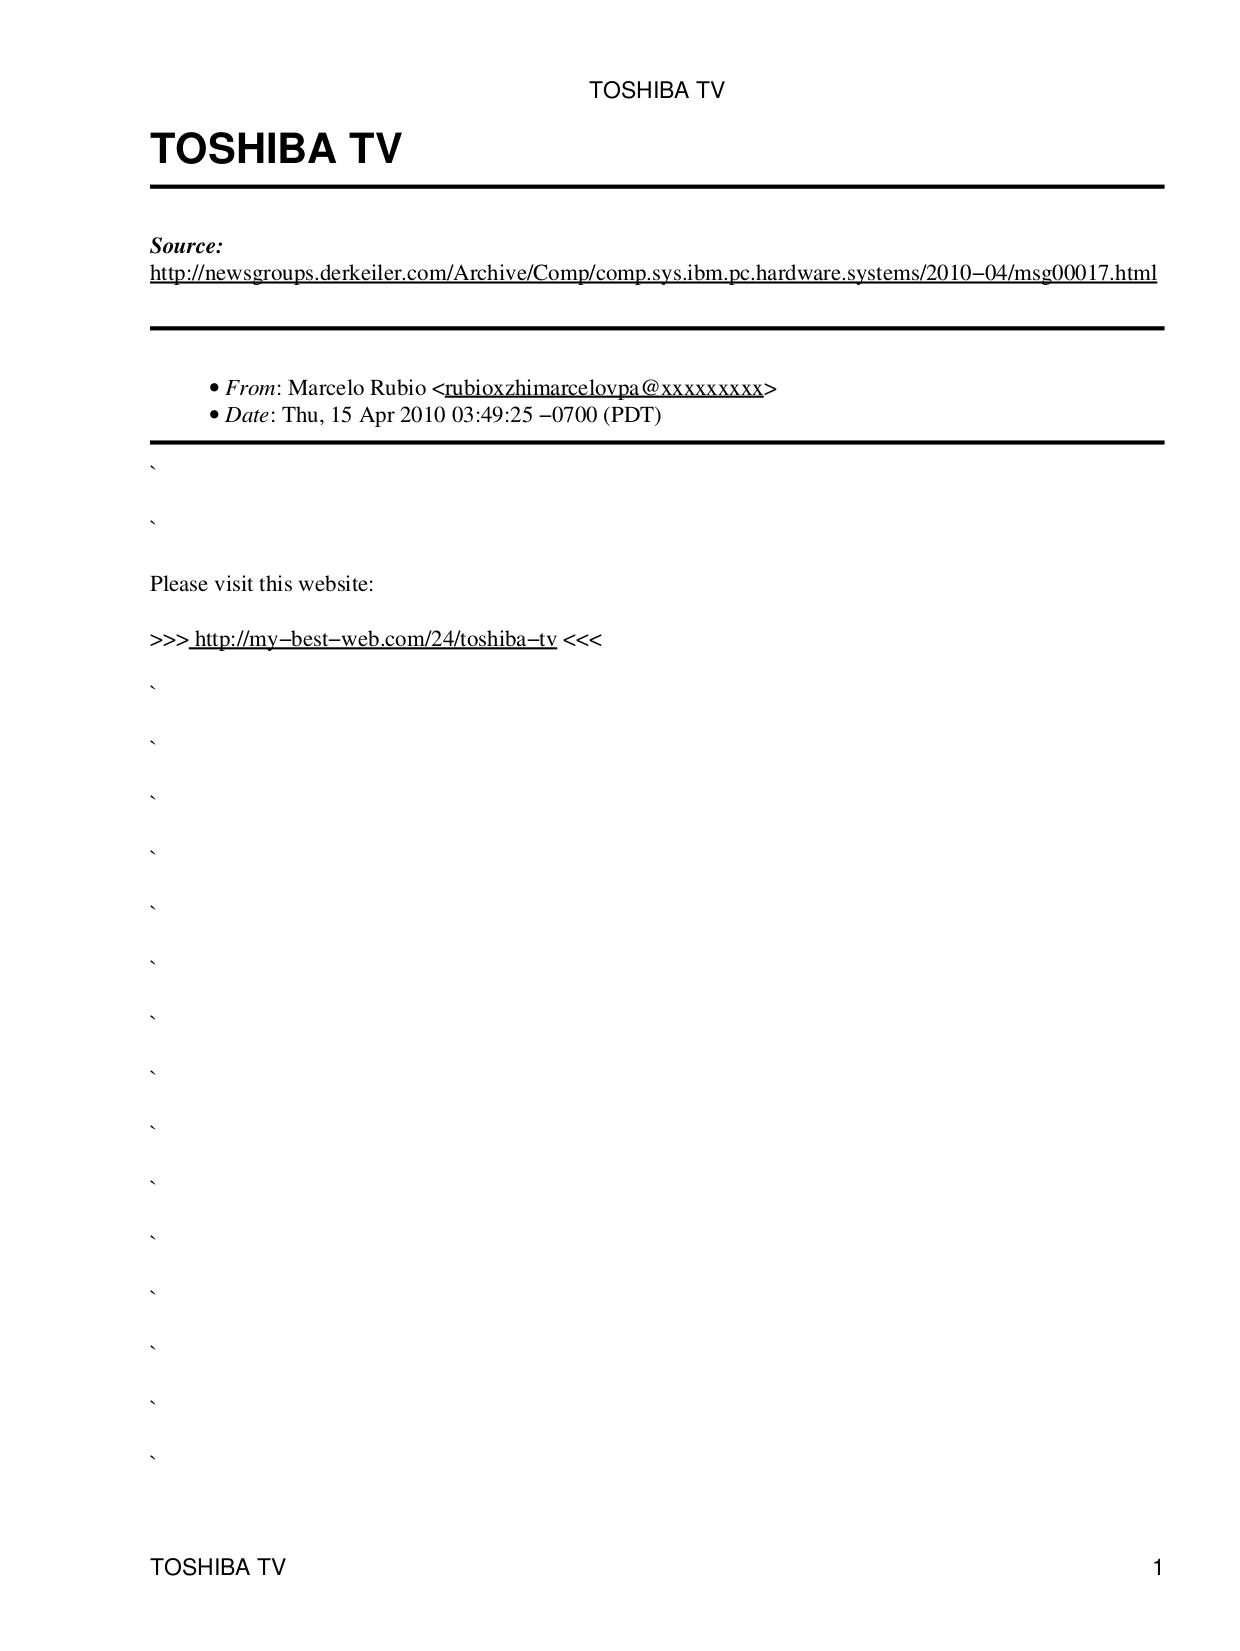 toshiba model 42hl900a manual pdf